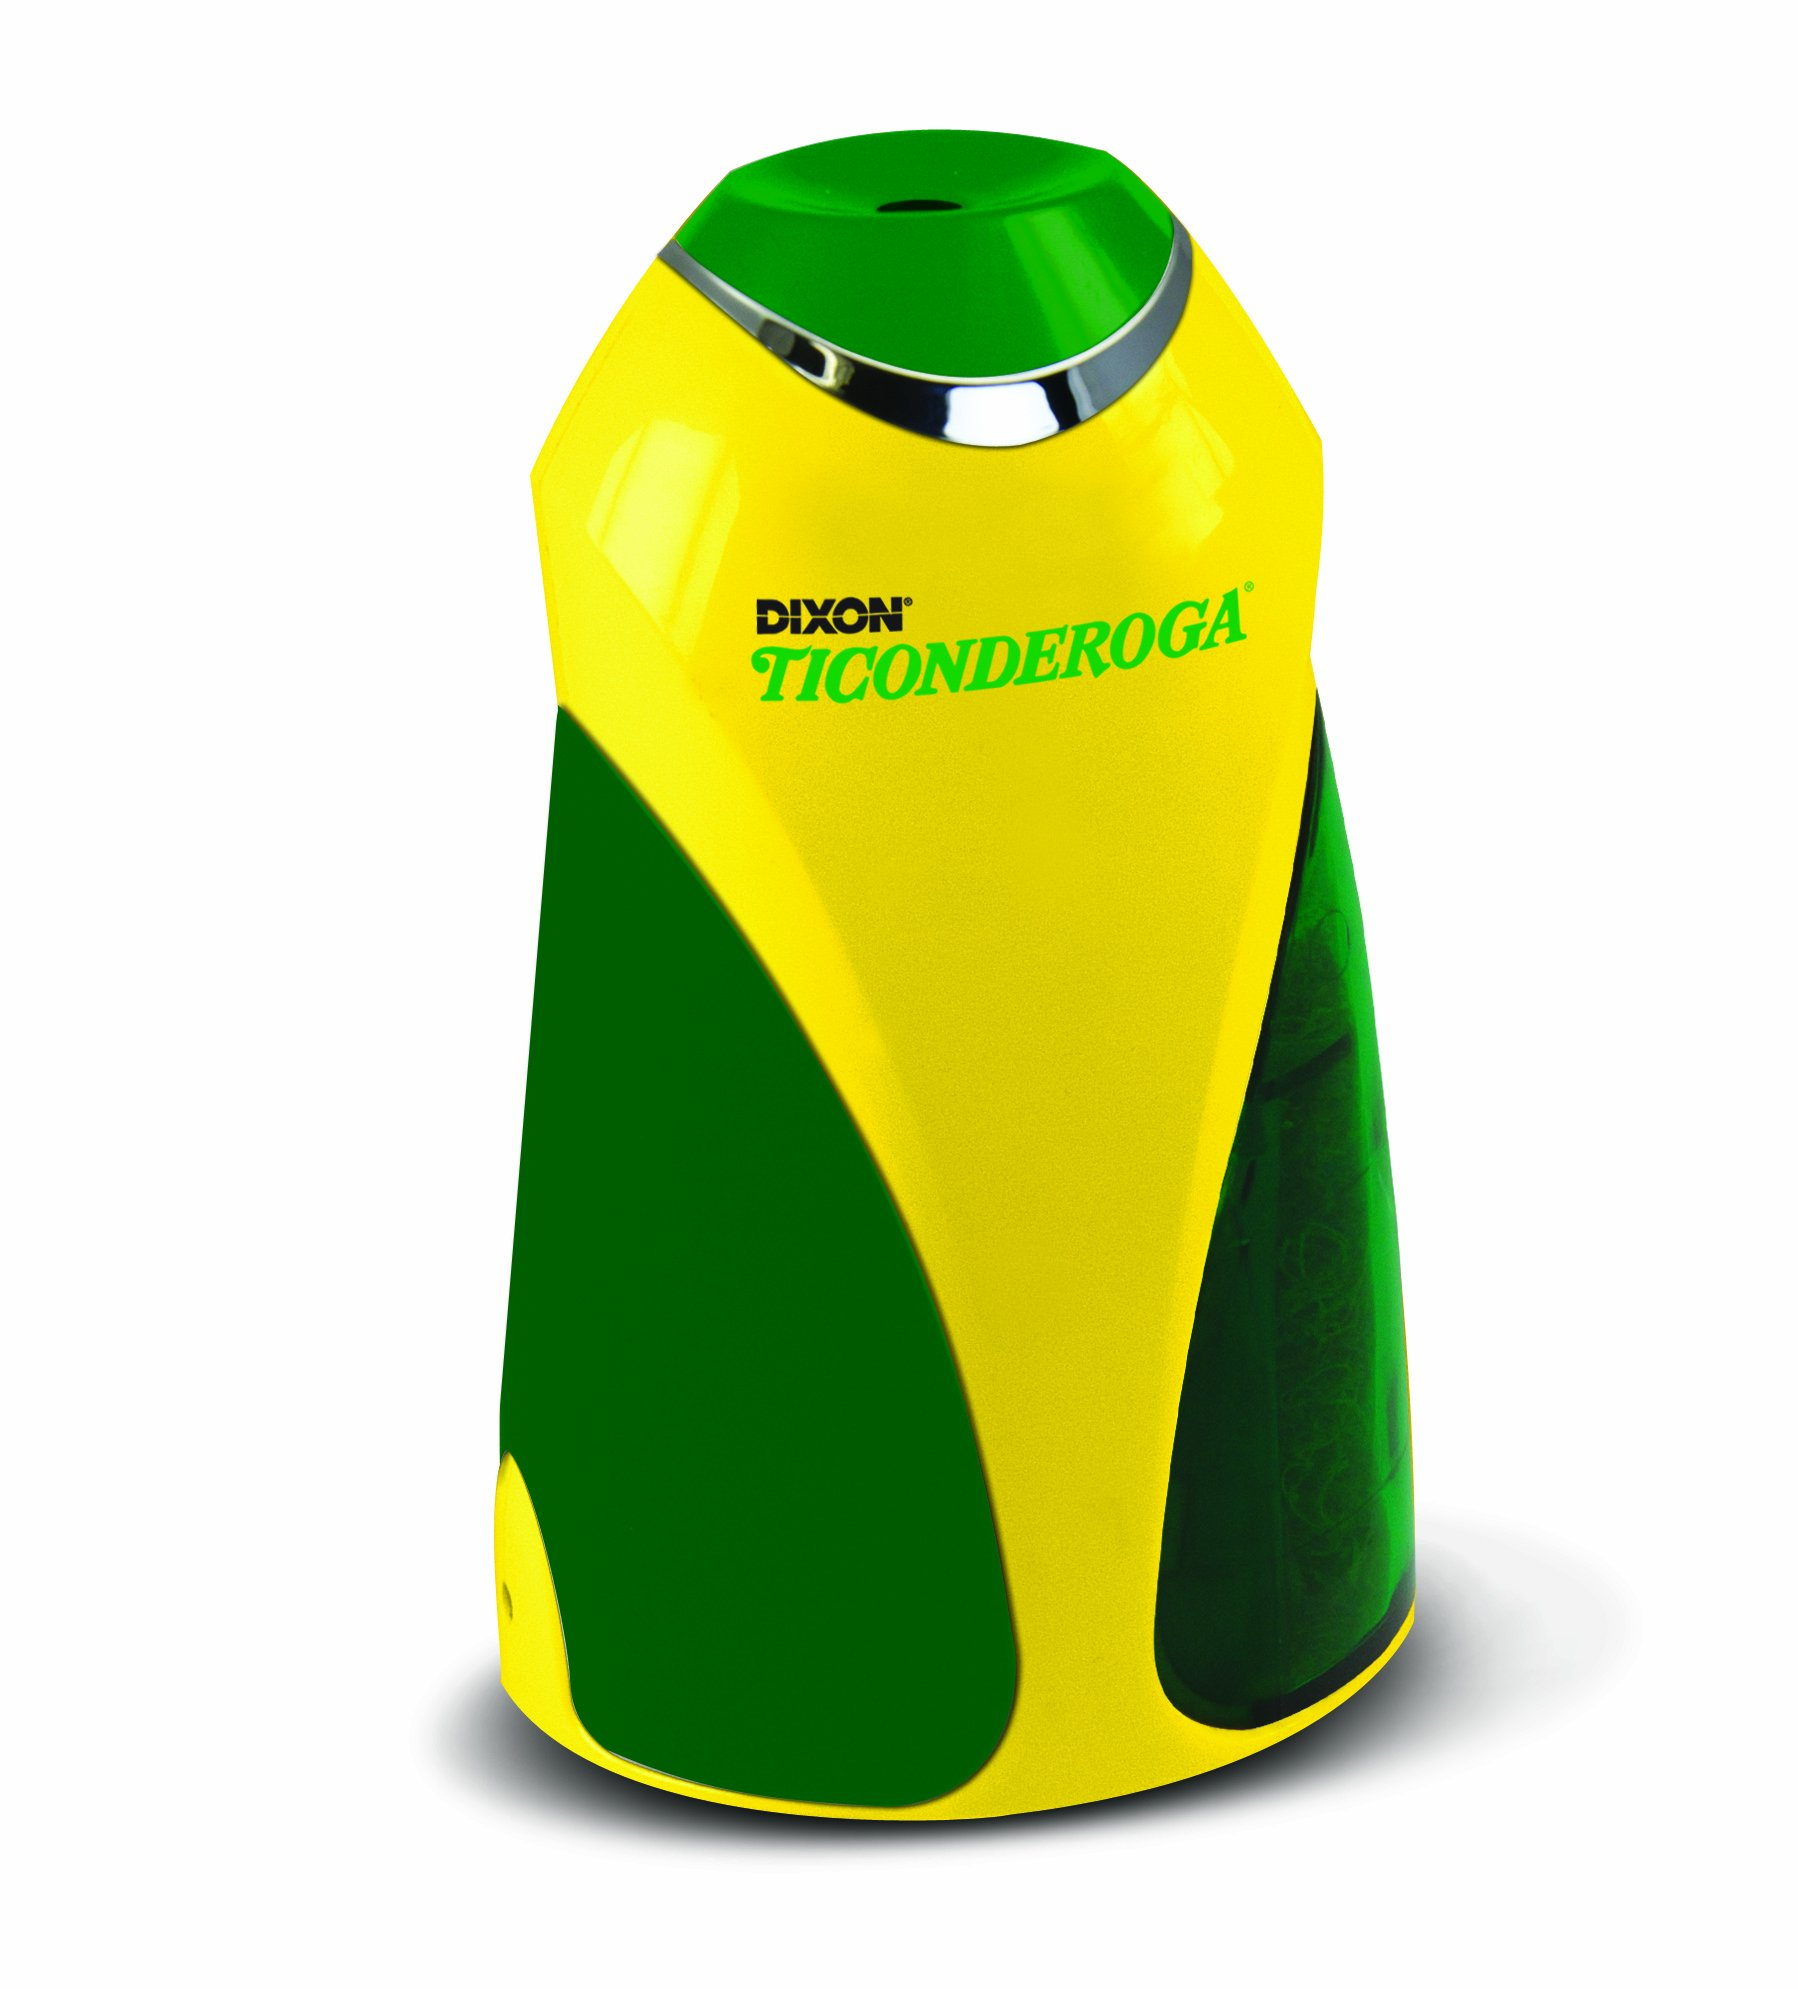 Ticonderoga Personal Electric Pencil Sharpener, Vertical, Yellow and Green, Plus 12 Ticonderoga Pencils (39571)